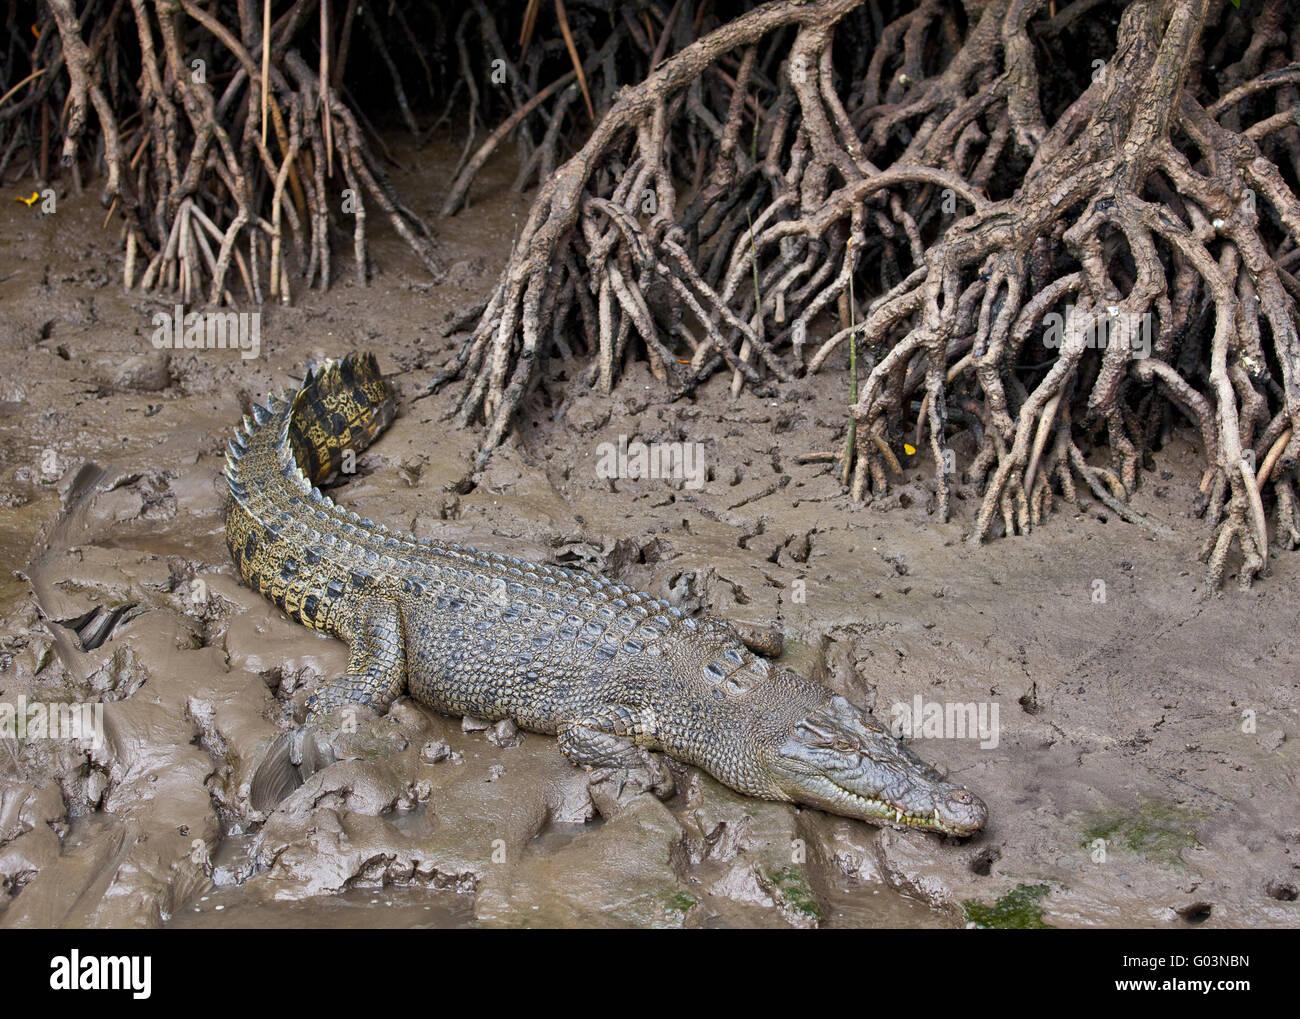 El cocodrilo de agua salada, Australia Foto de stock